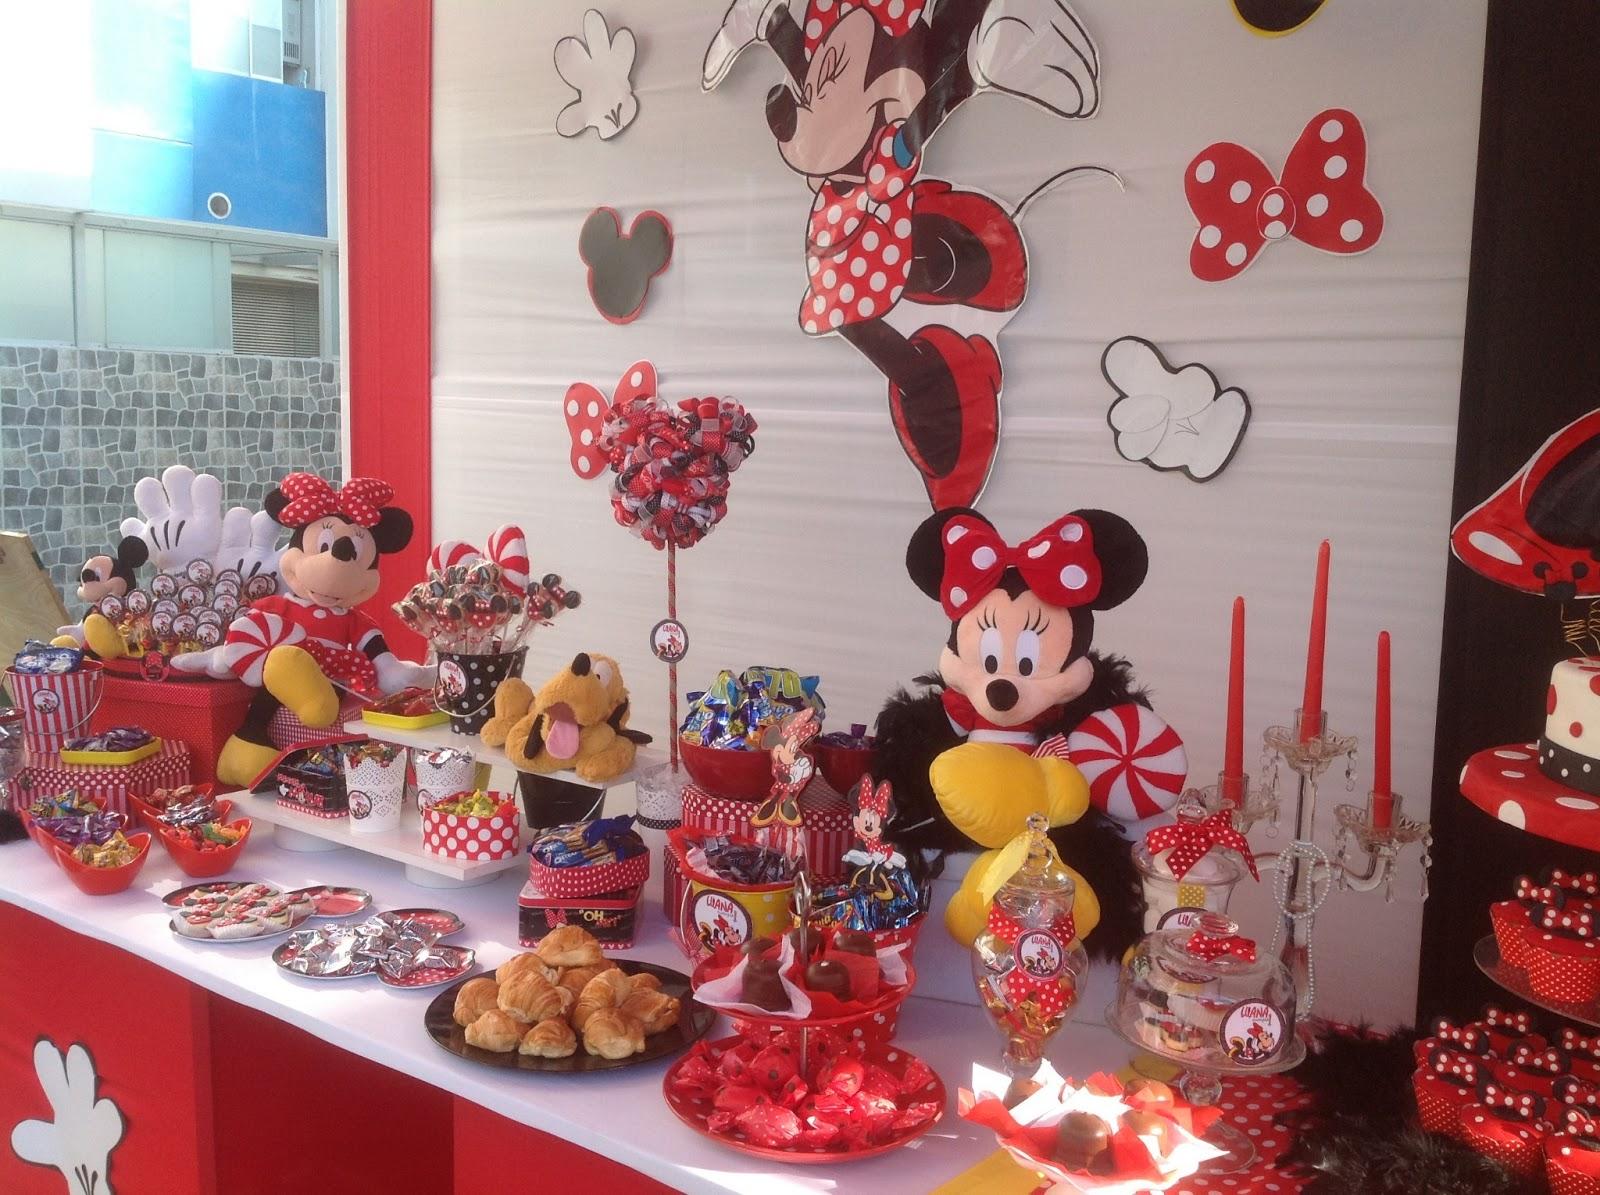 Mesa De Dulces Fiesta Infantil Ideas Para Decorar Mesas De Postres